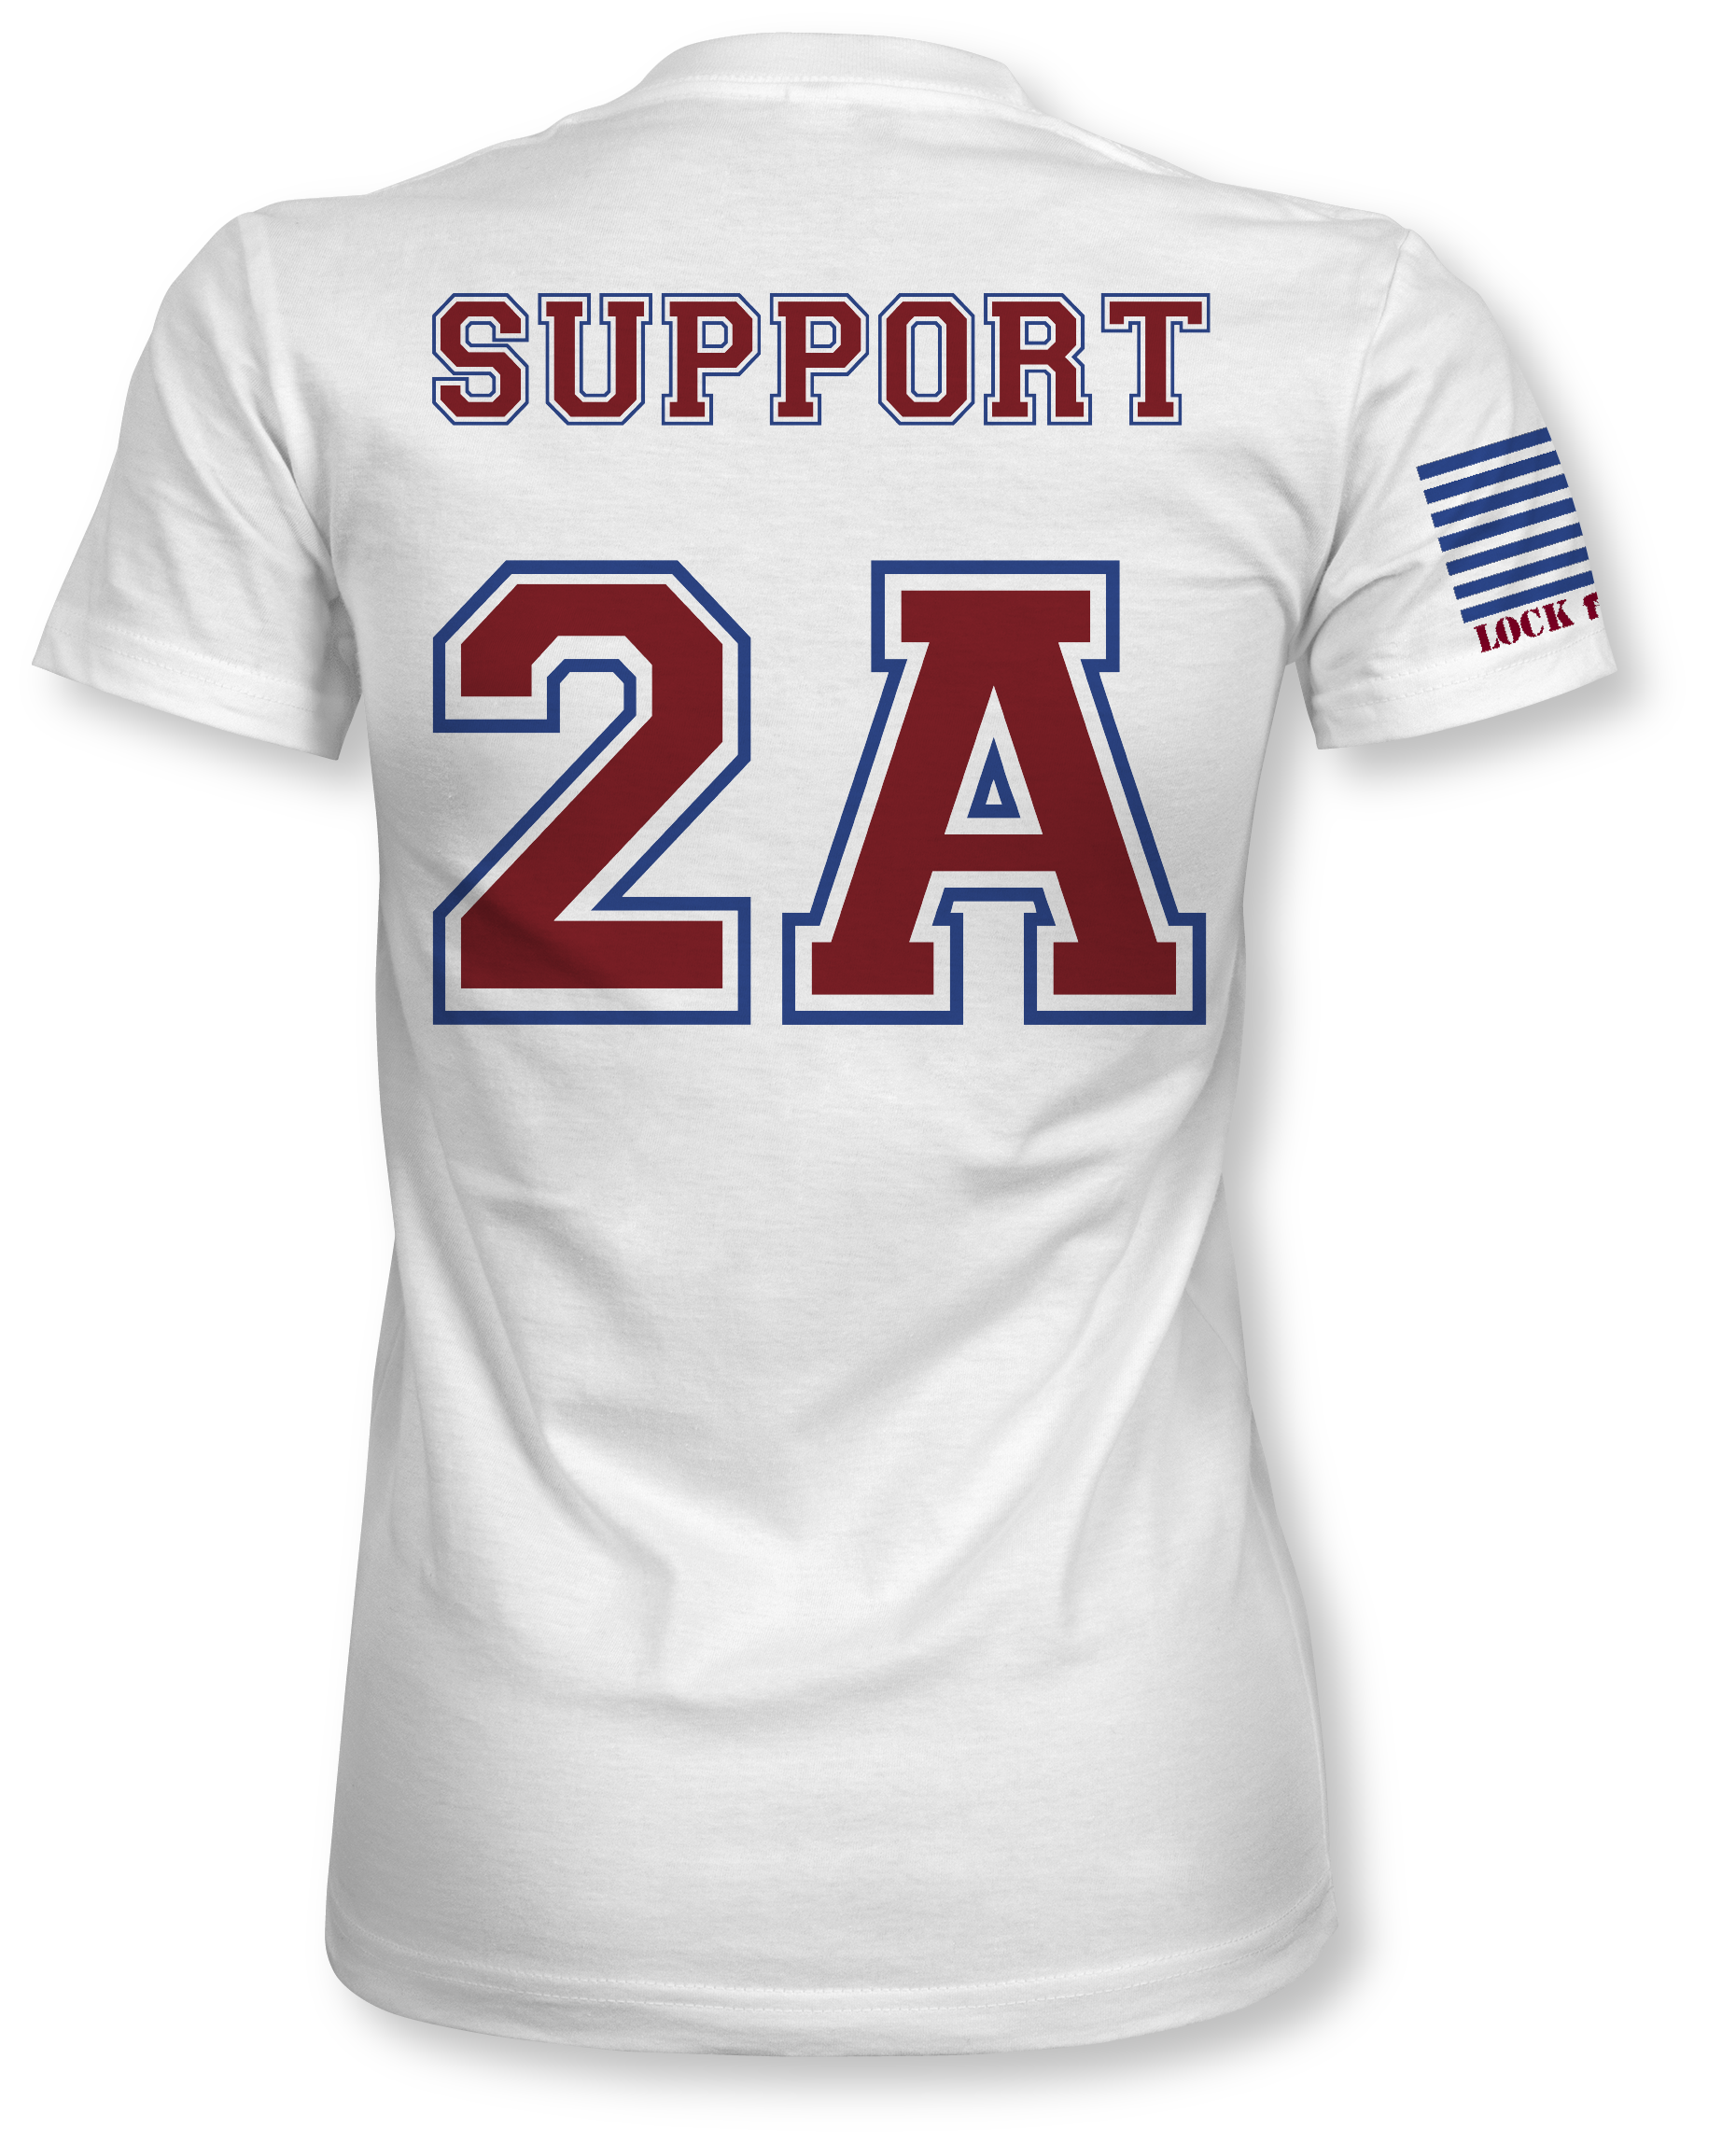 Support 2A - Women's TP20021900090000